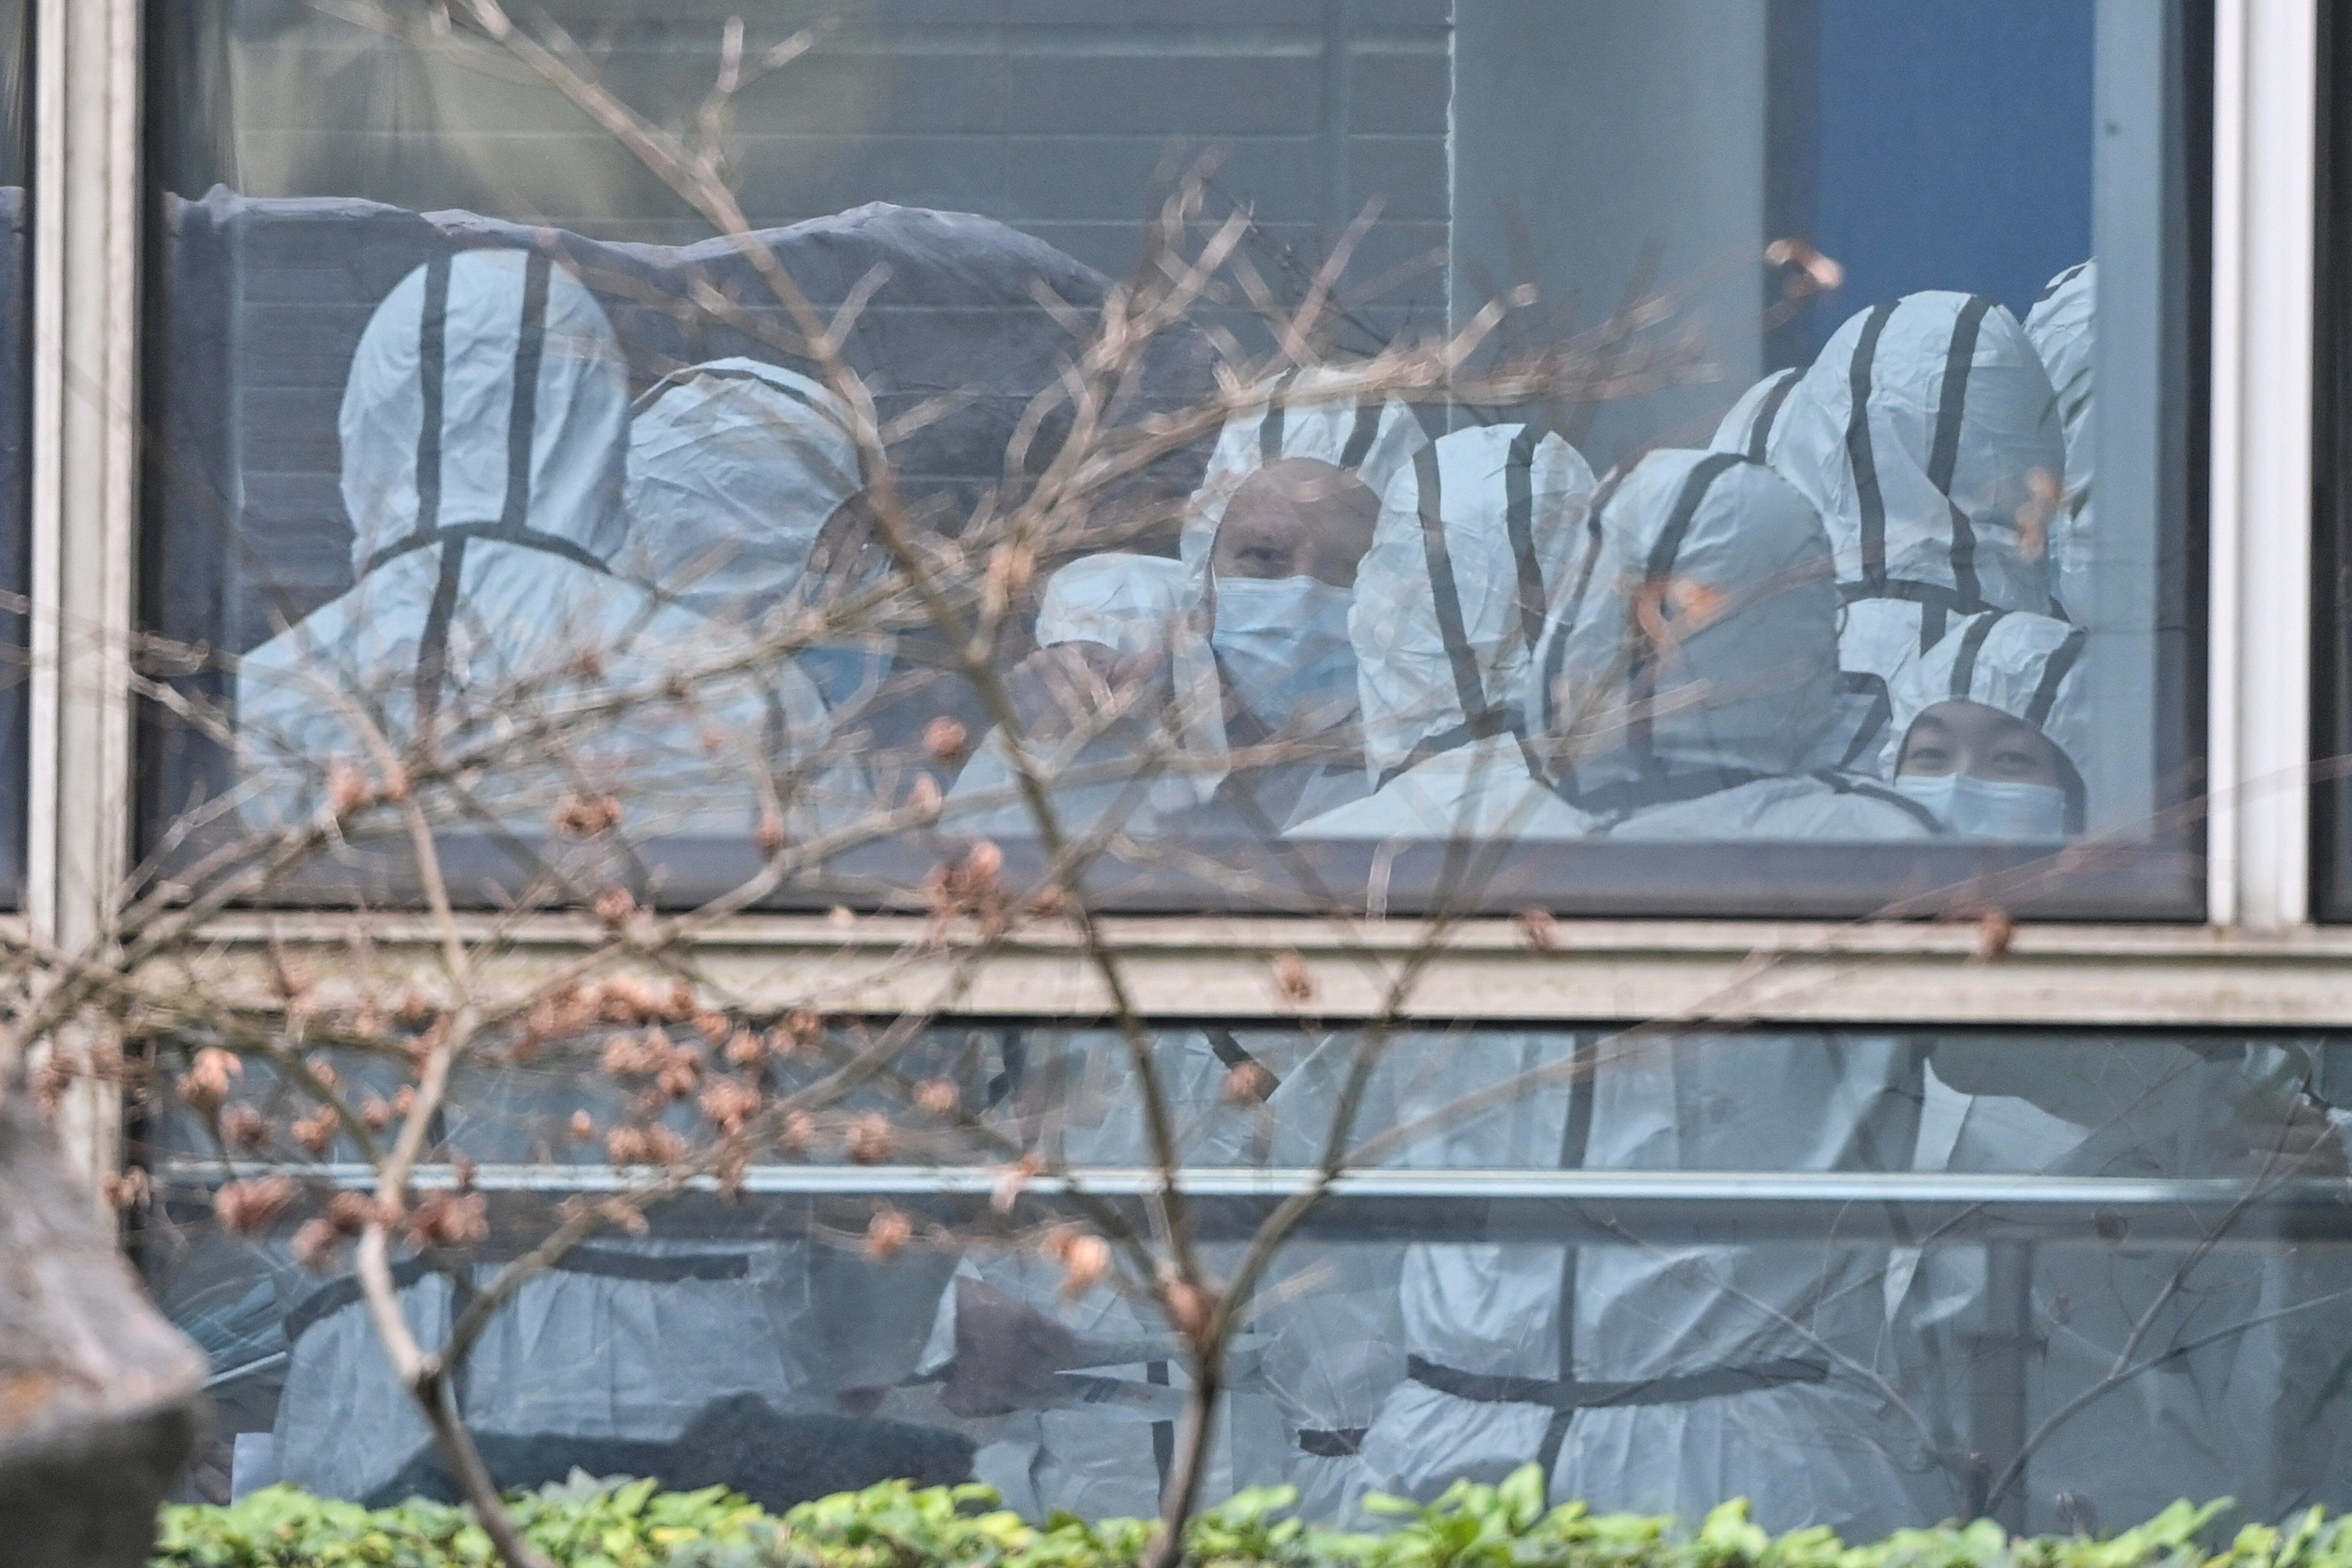 Members of the World Health Organization team investigating the origins of the coronavirus, visited the Hubei Center for anim